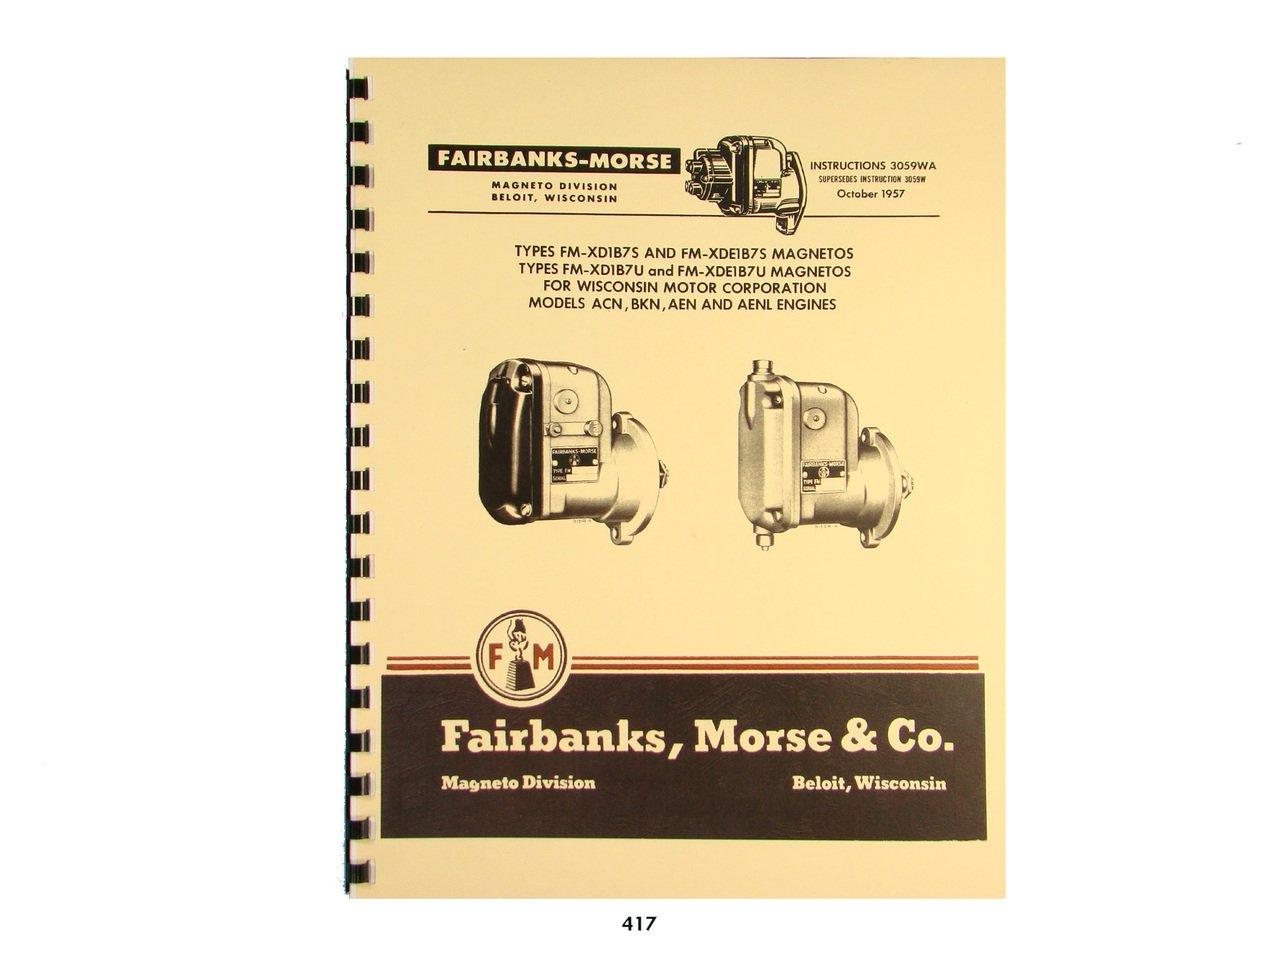 Fairbanks Morse Magneto Instruct & Parts Manual for Wisconsin Engines: Fairbanks  Morse: Amazon.com: Books